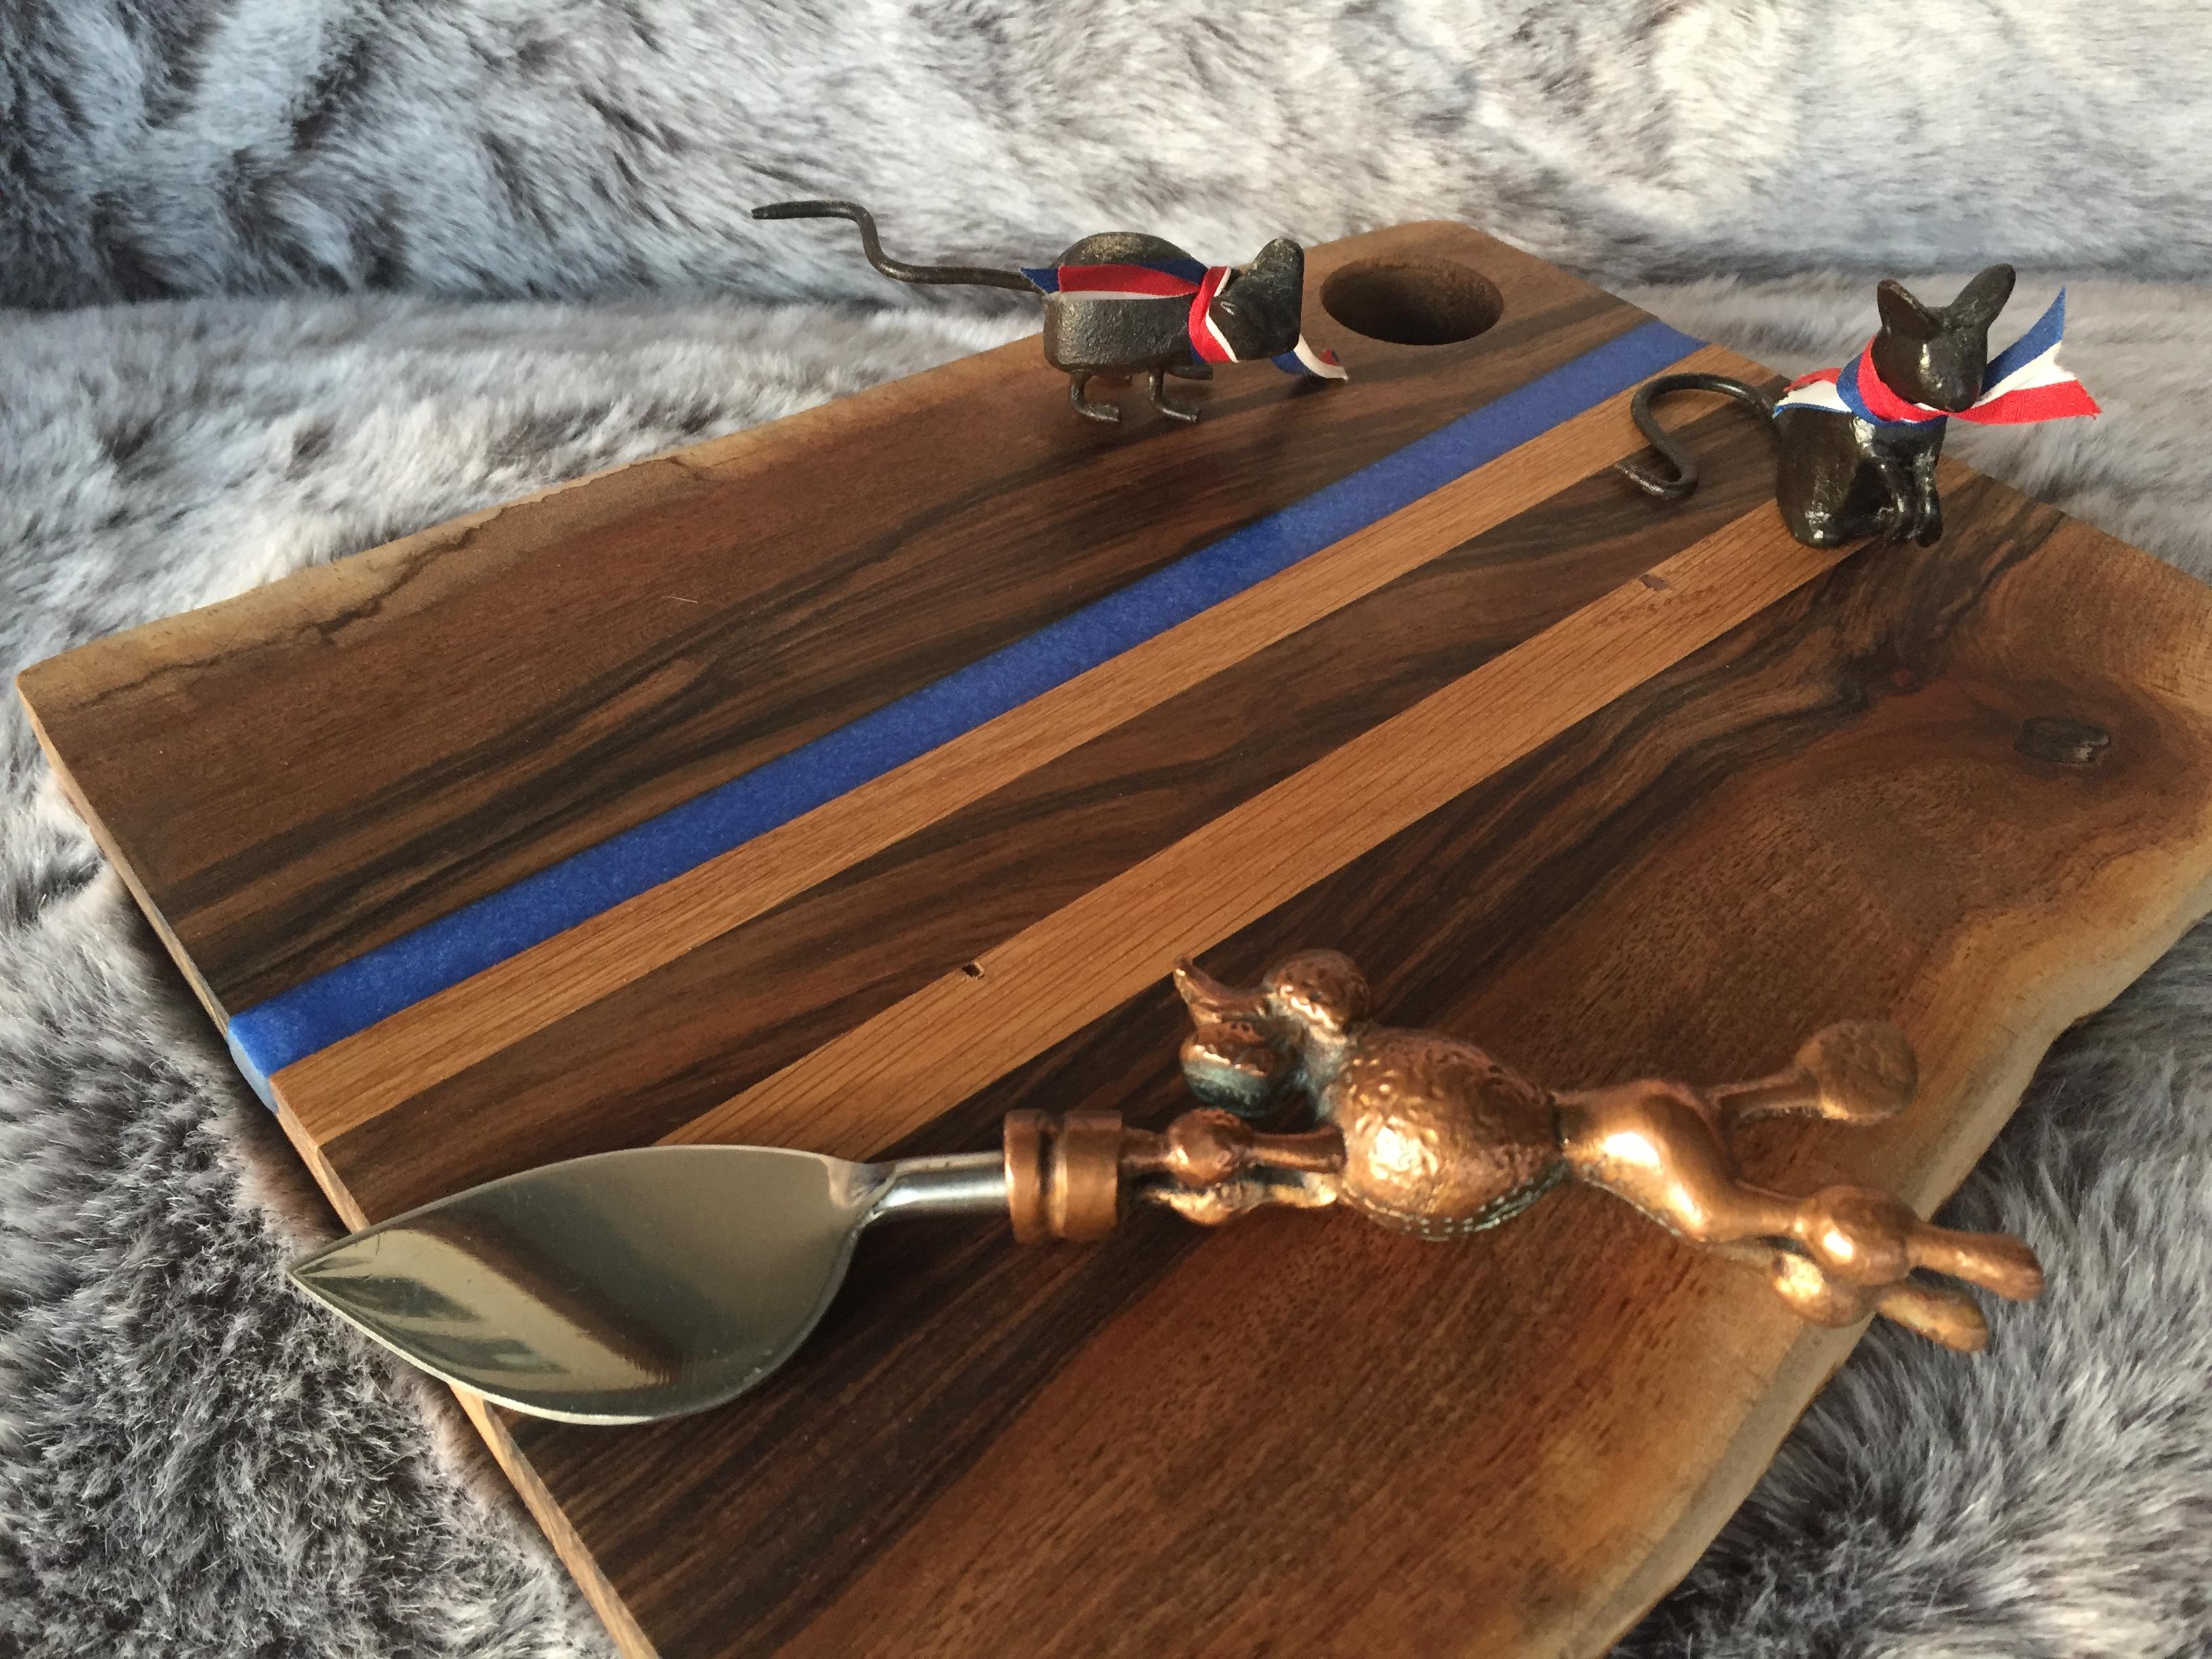 Blue Epoxy Resin chopping board